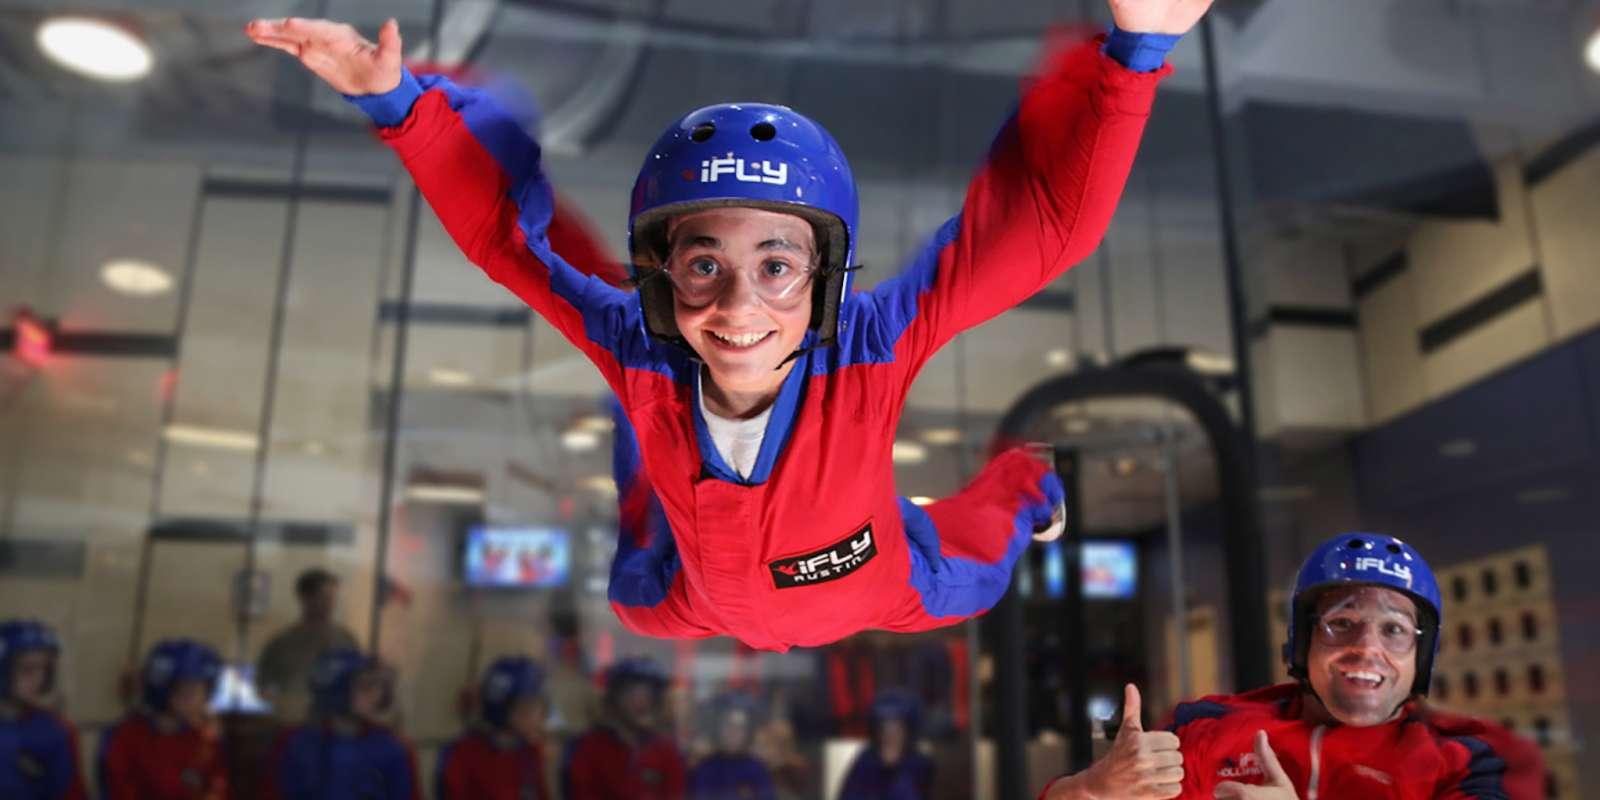 Kids fun at iFly indoor skydiving